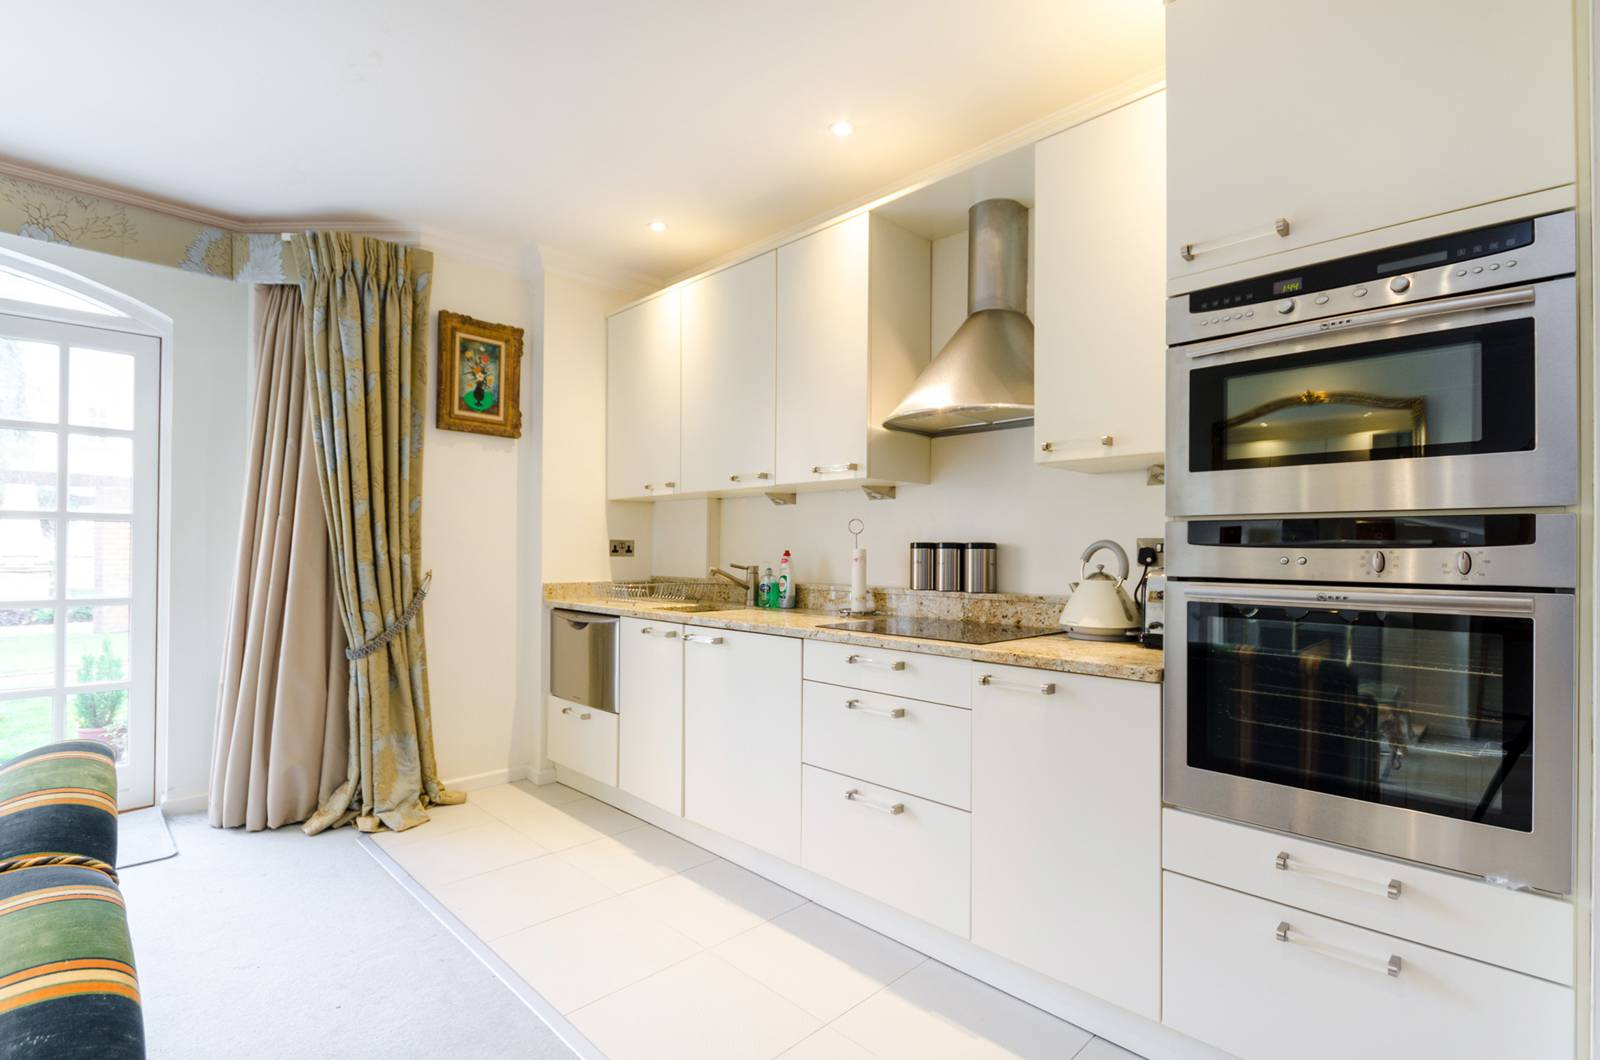 2 Bedroom Flat To Rent In Queens Reach East Molesey Kt8 London